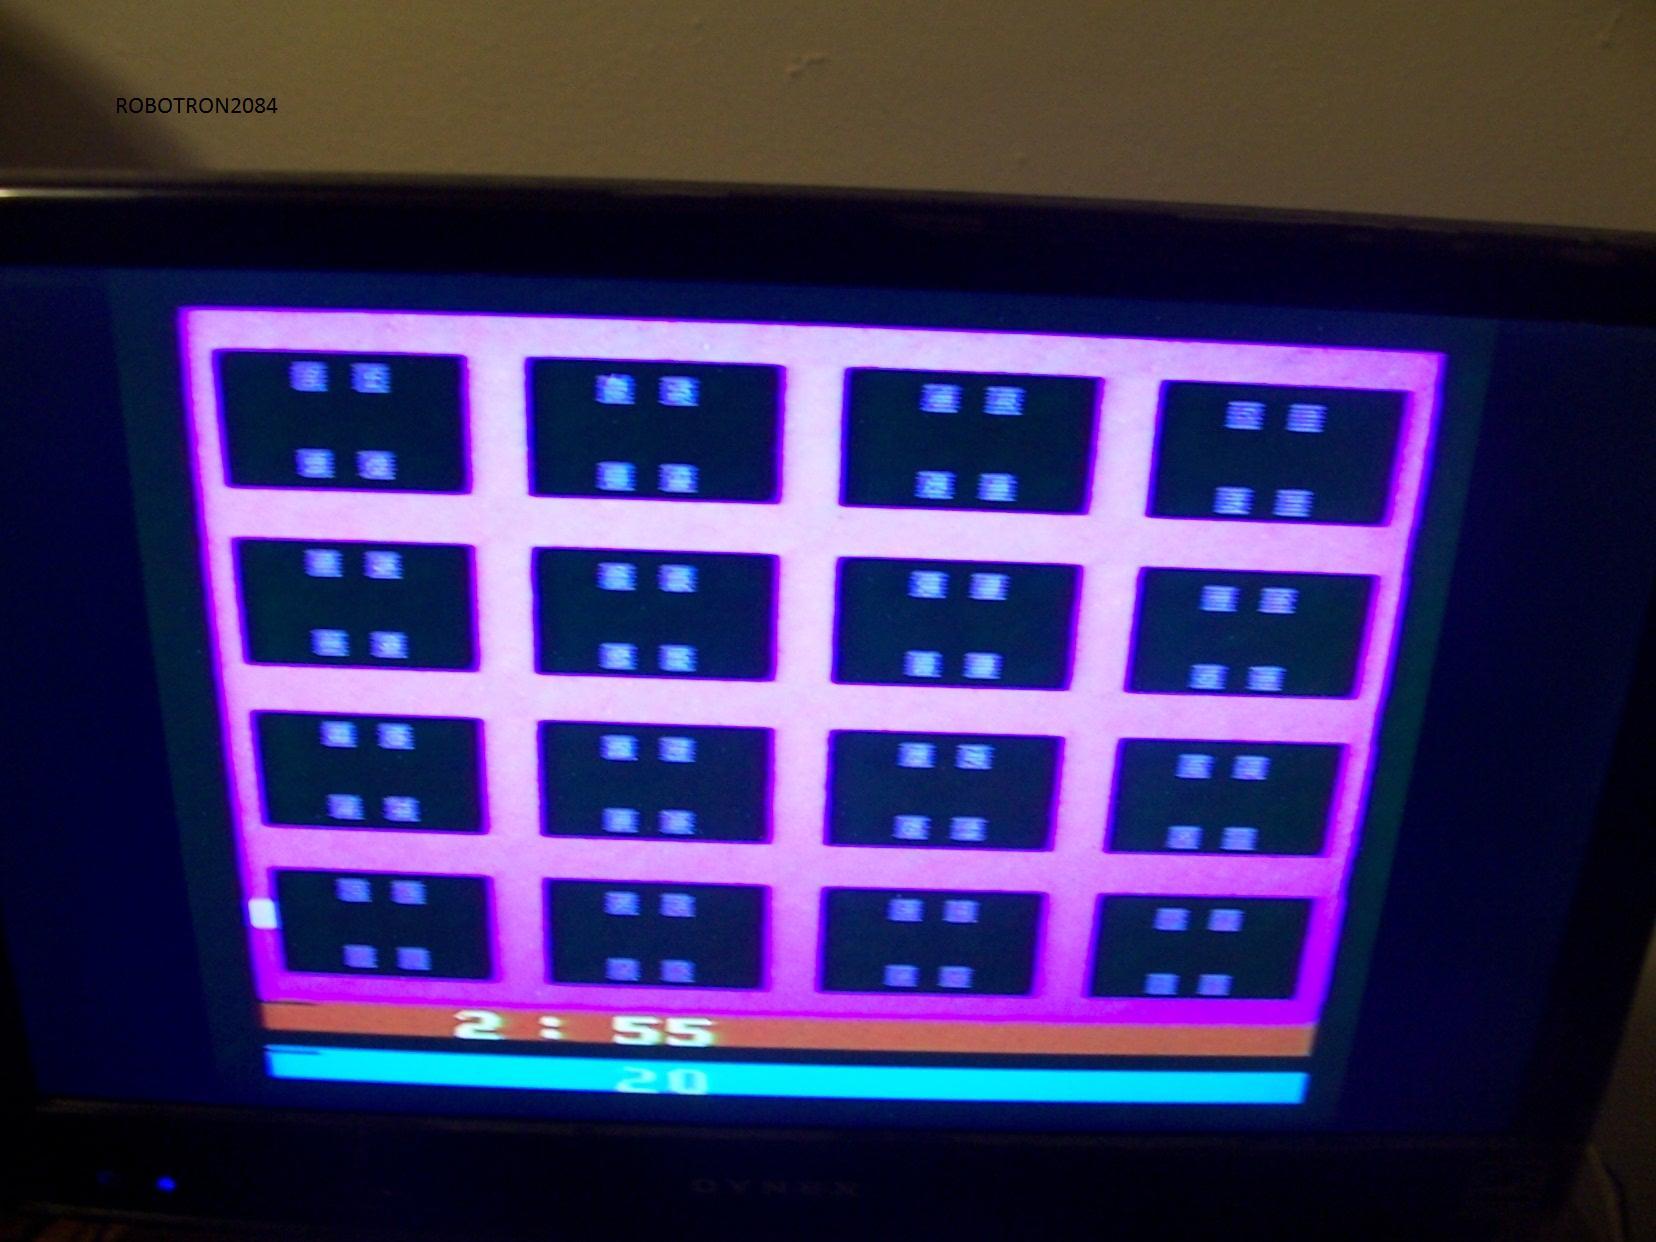 Robotron2084: Dice Puzzle (Atari 2600) 0:02:55 points on 2014-01-19 13:50:13